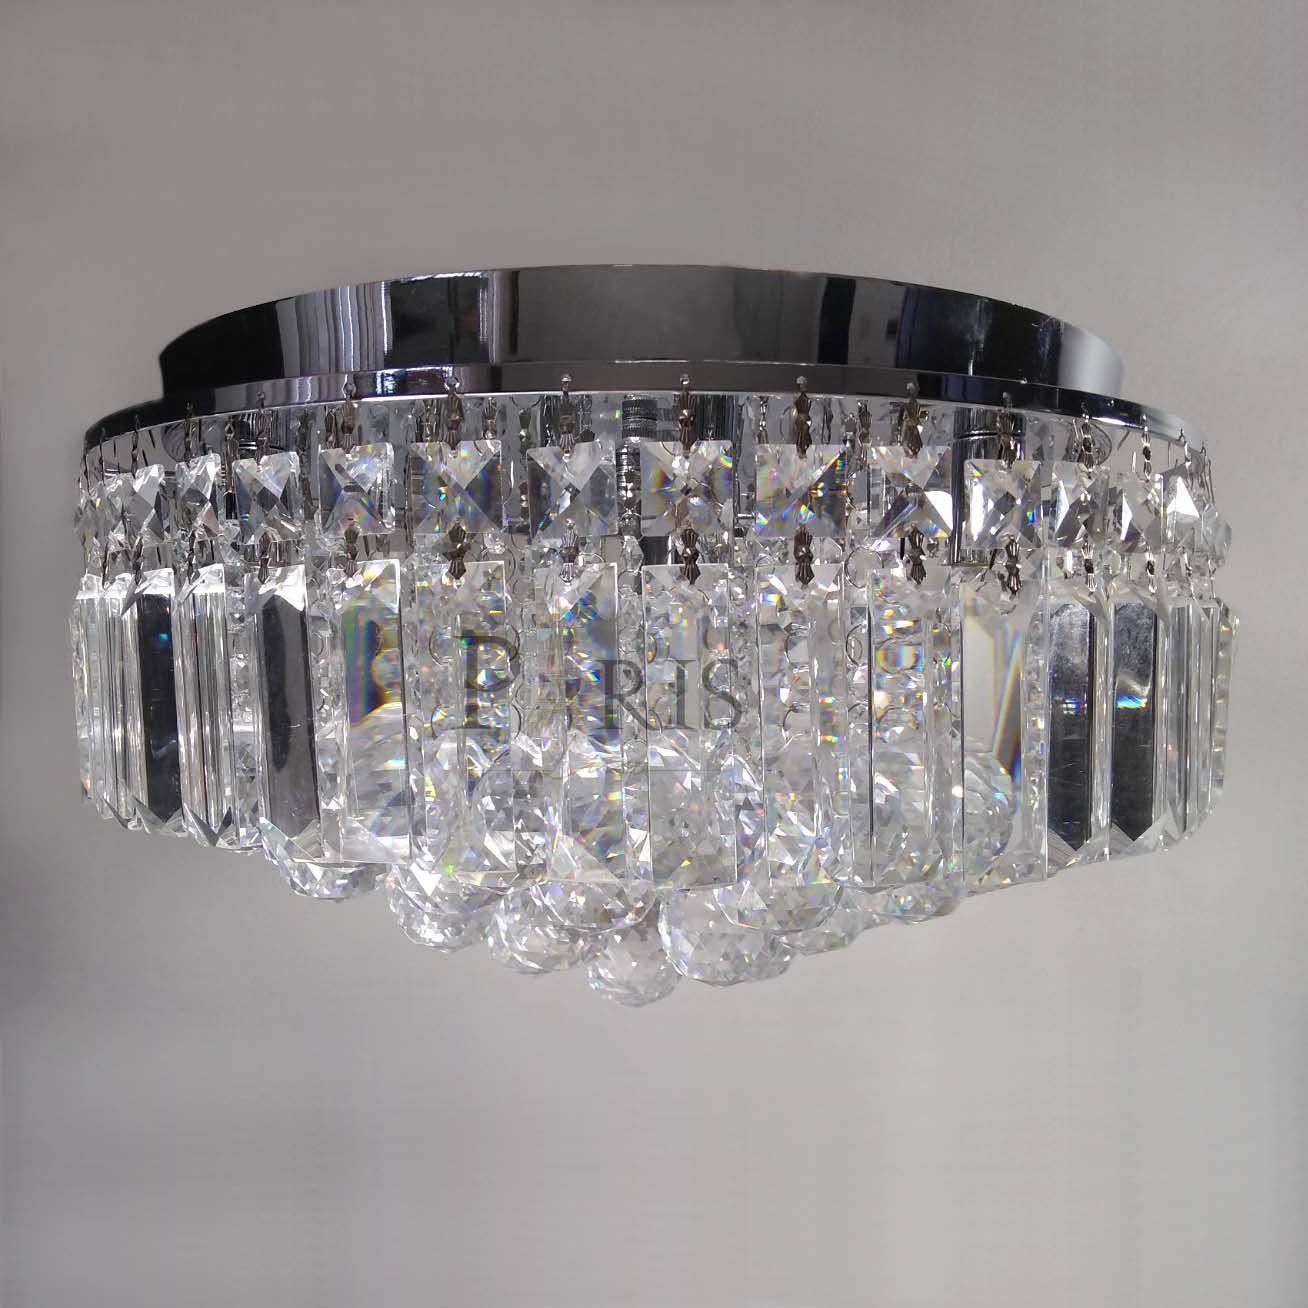 Plafon Kri Cristal HU1103 Transparente 5G9 40CM Bella